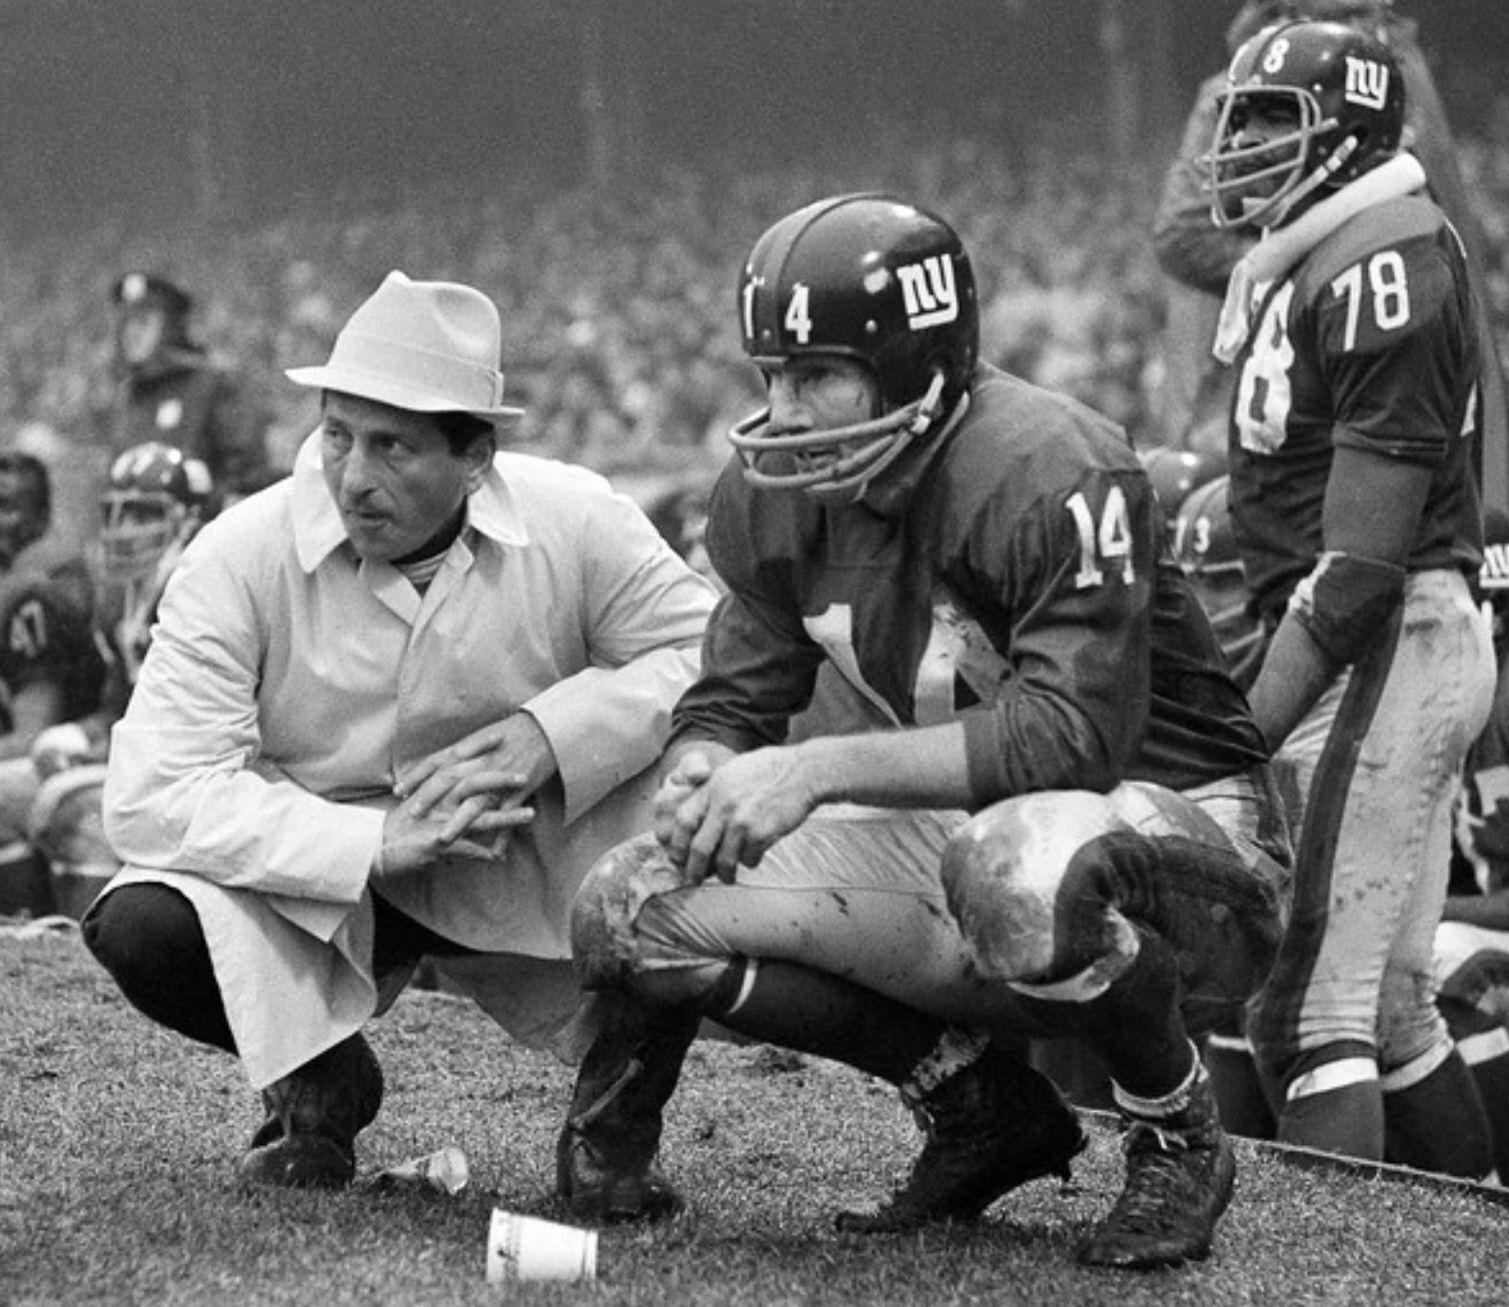 New York Giants' head coach Alie Sherman with QB Y. A. Tittle (1960).